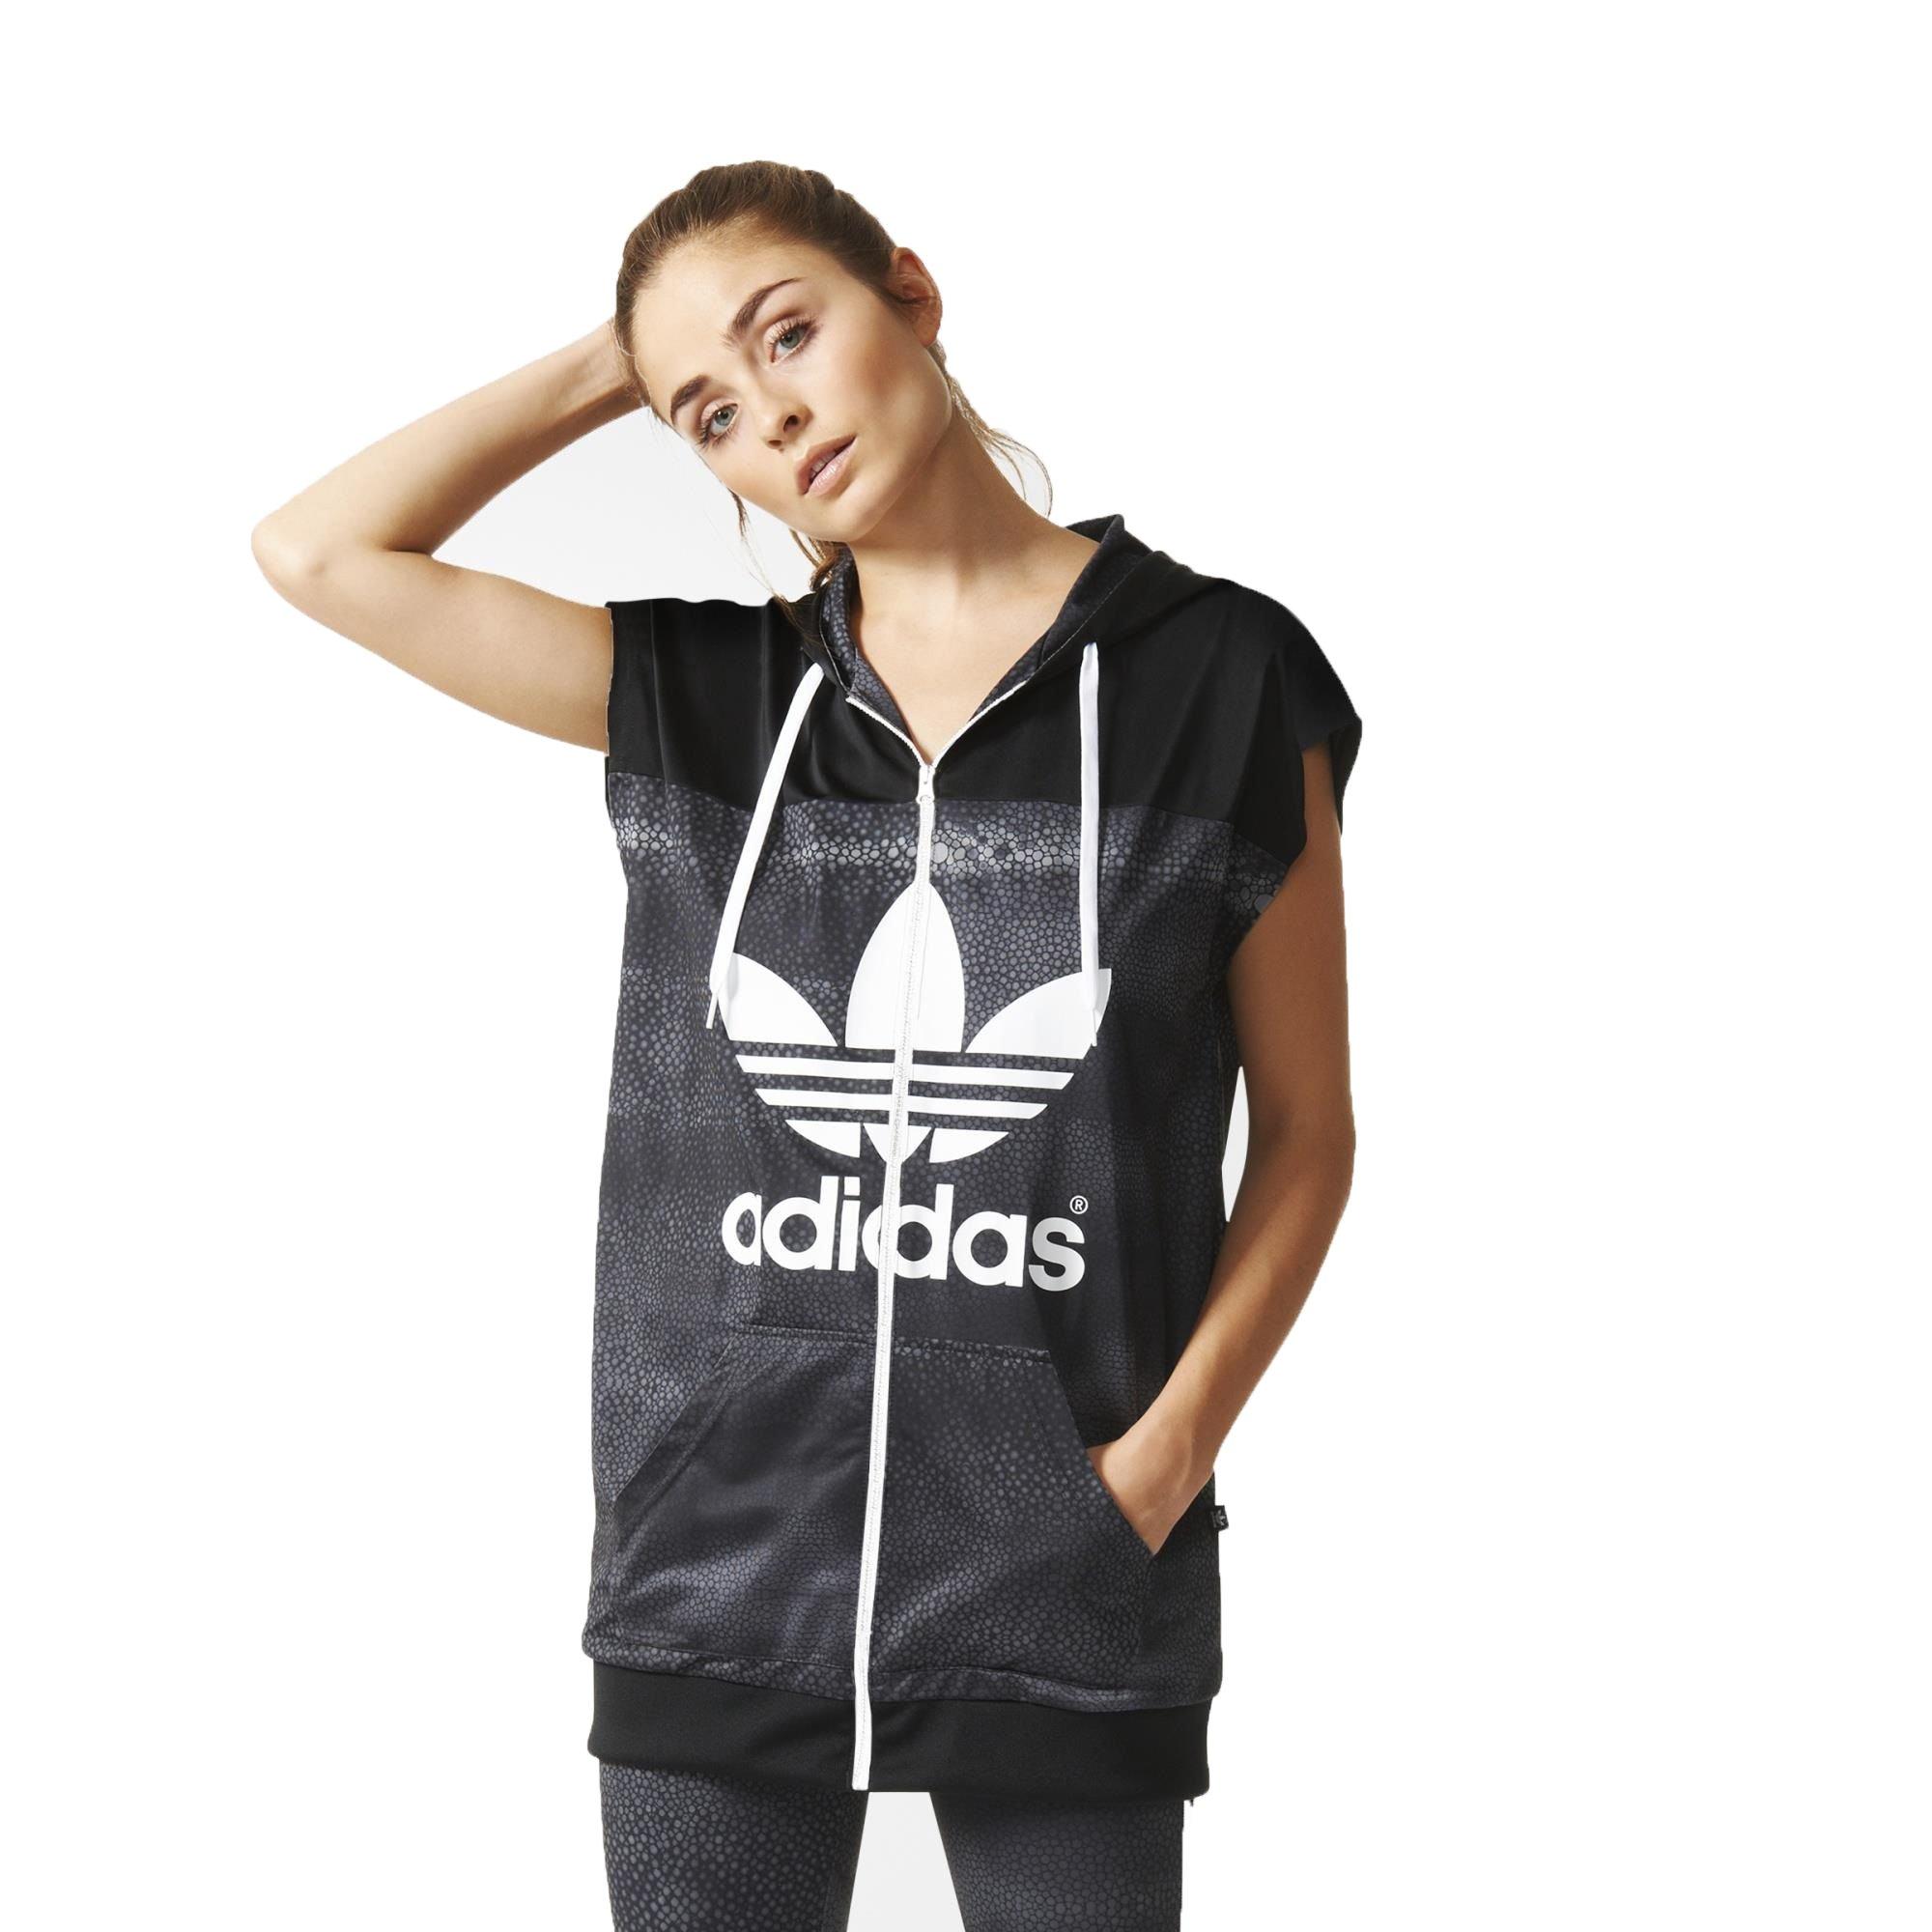 Adidas Originals Rita Ora Mystic Moon TT Track Jacket AA3864 Black Women's Vest (size Medium) by adidas